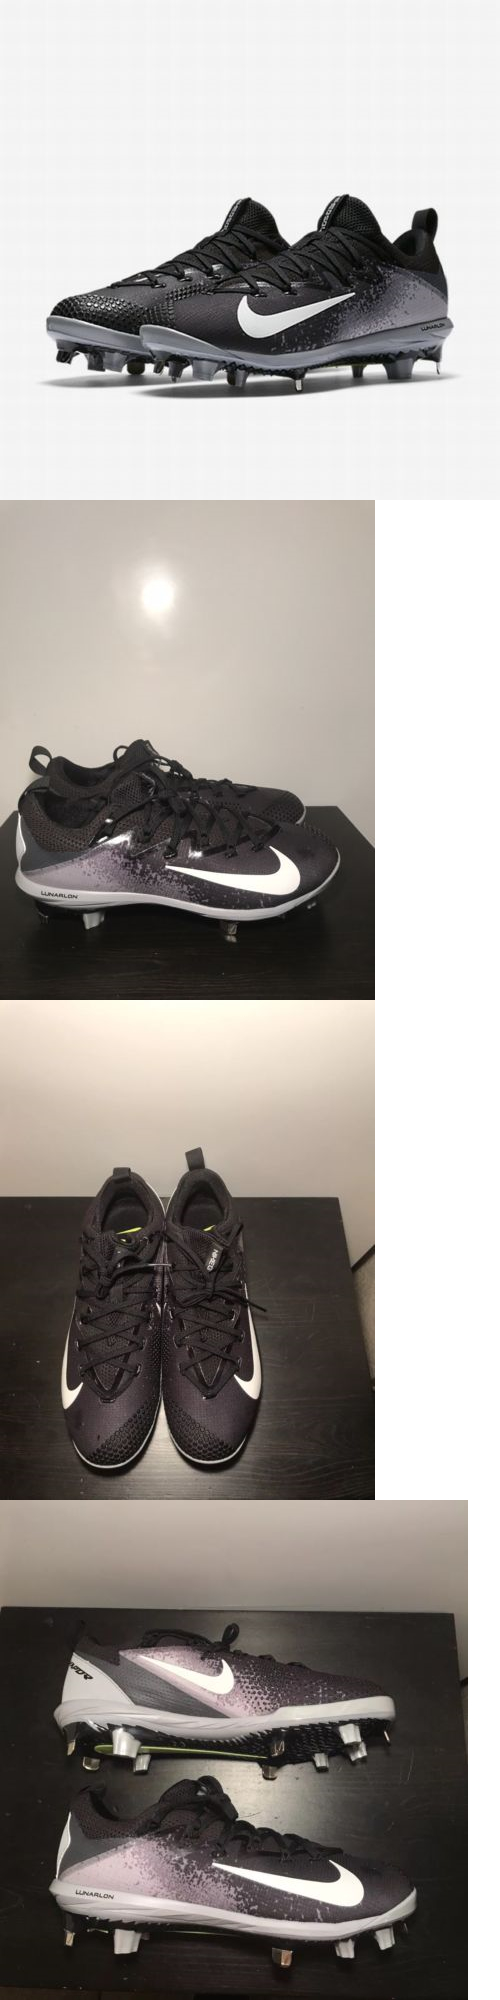 7986234110cb Mens 159059: Nike Lunar Vapor Ultrafly Elite Metal Baseball Cleats Size 9.5  Black Grey -